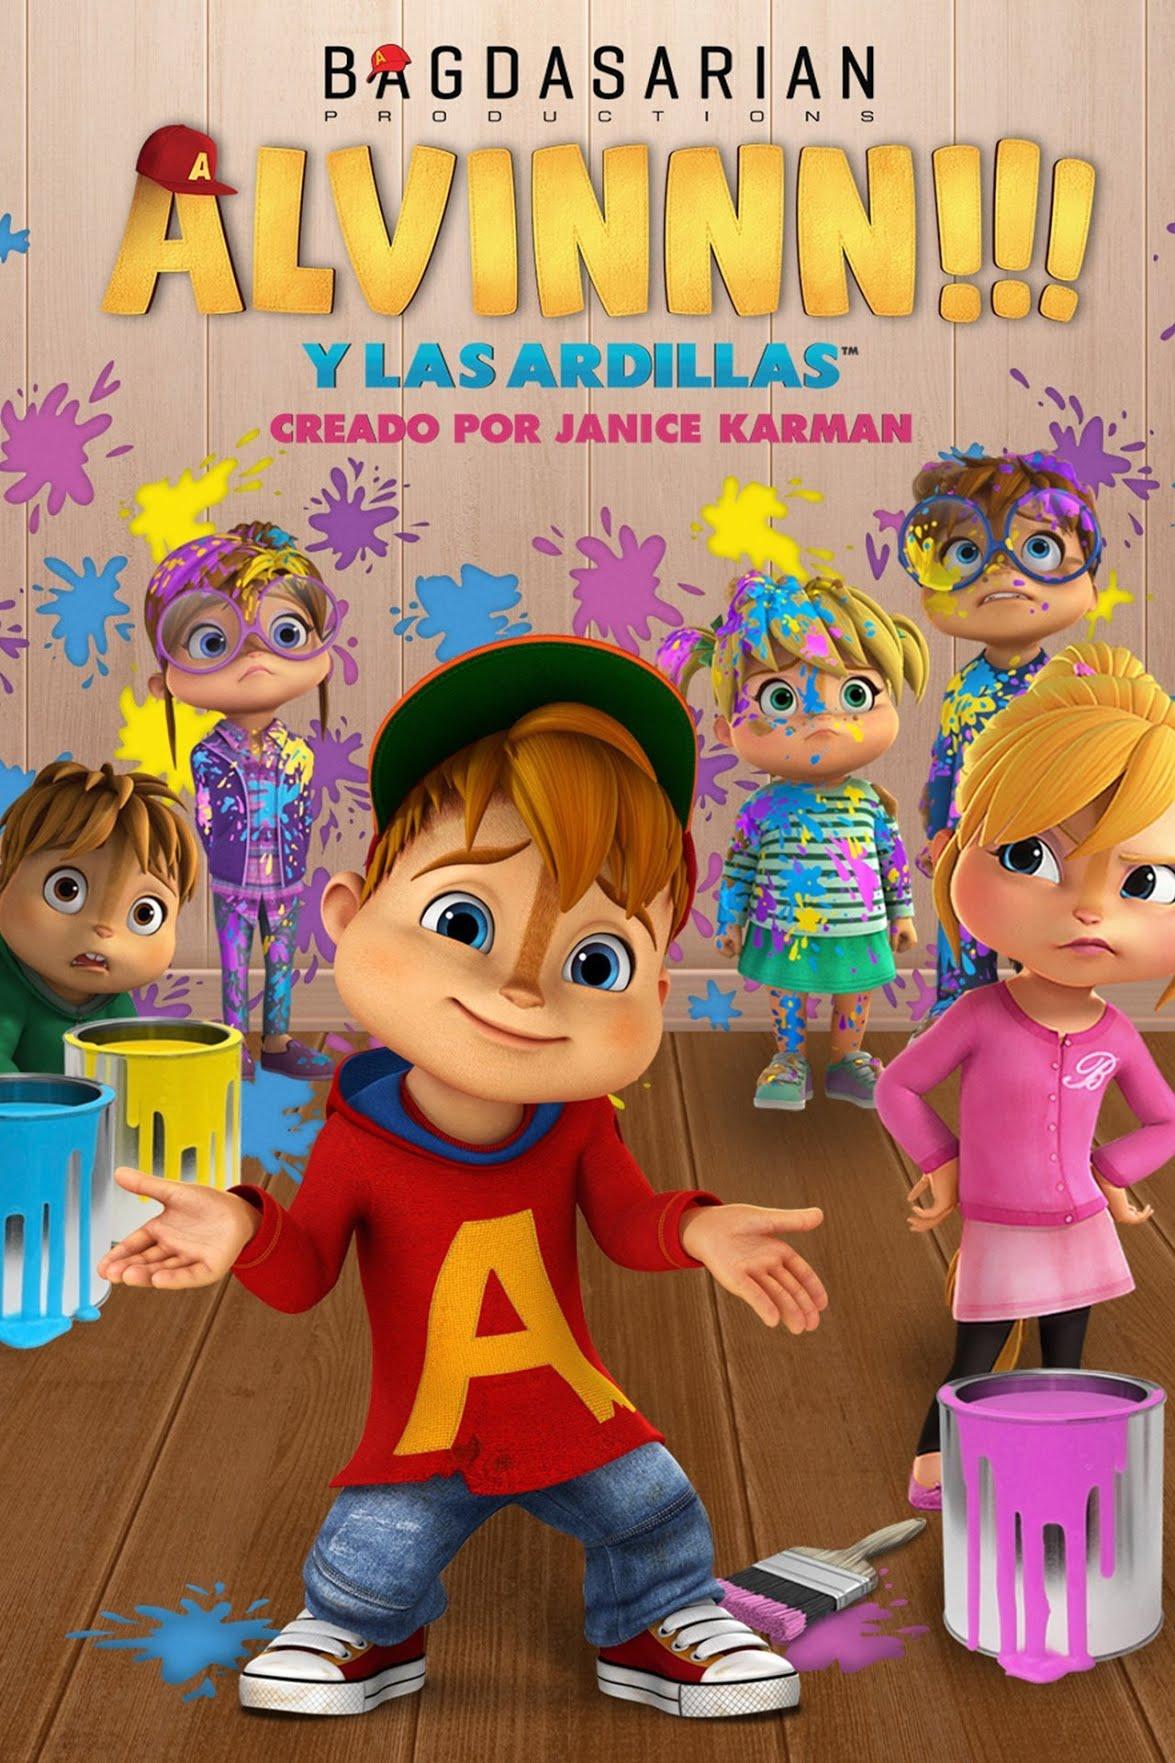 ALVINNN!!! y las ardillas